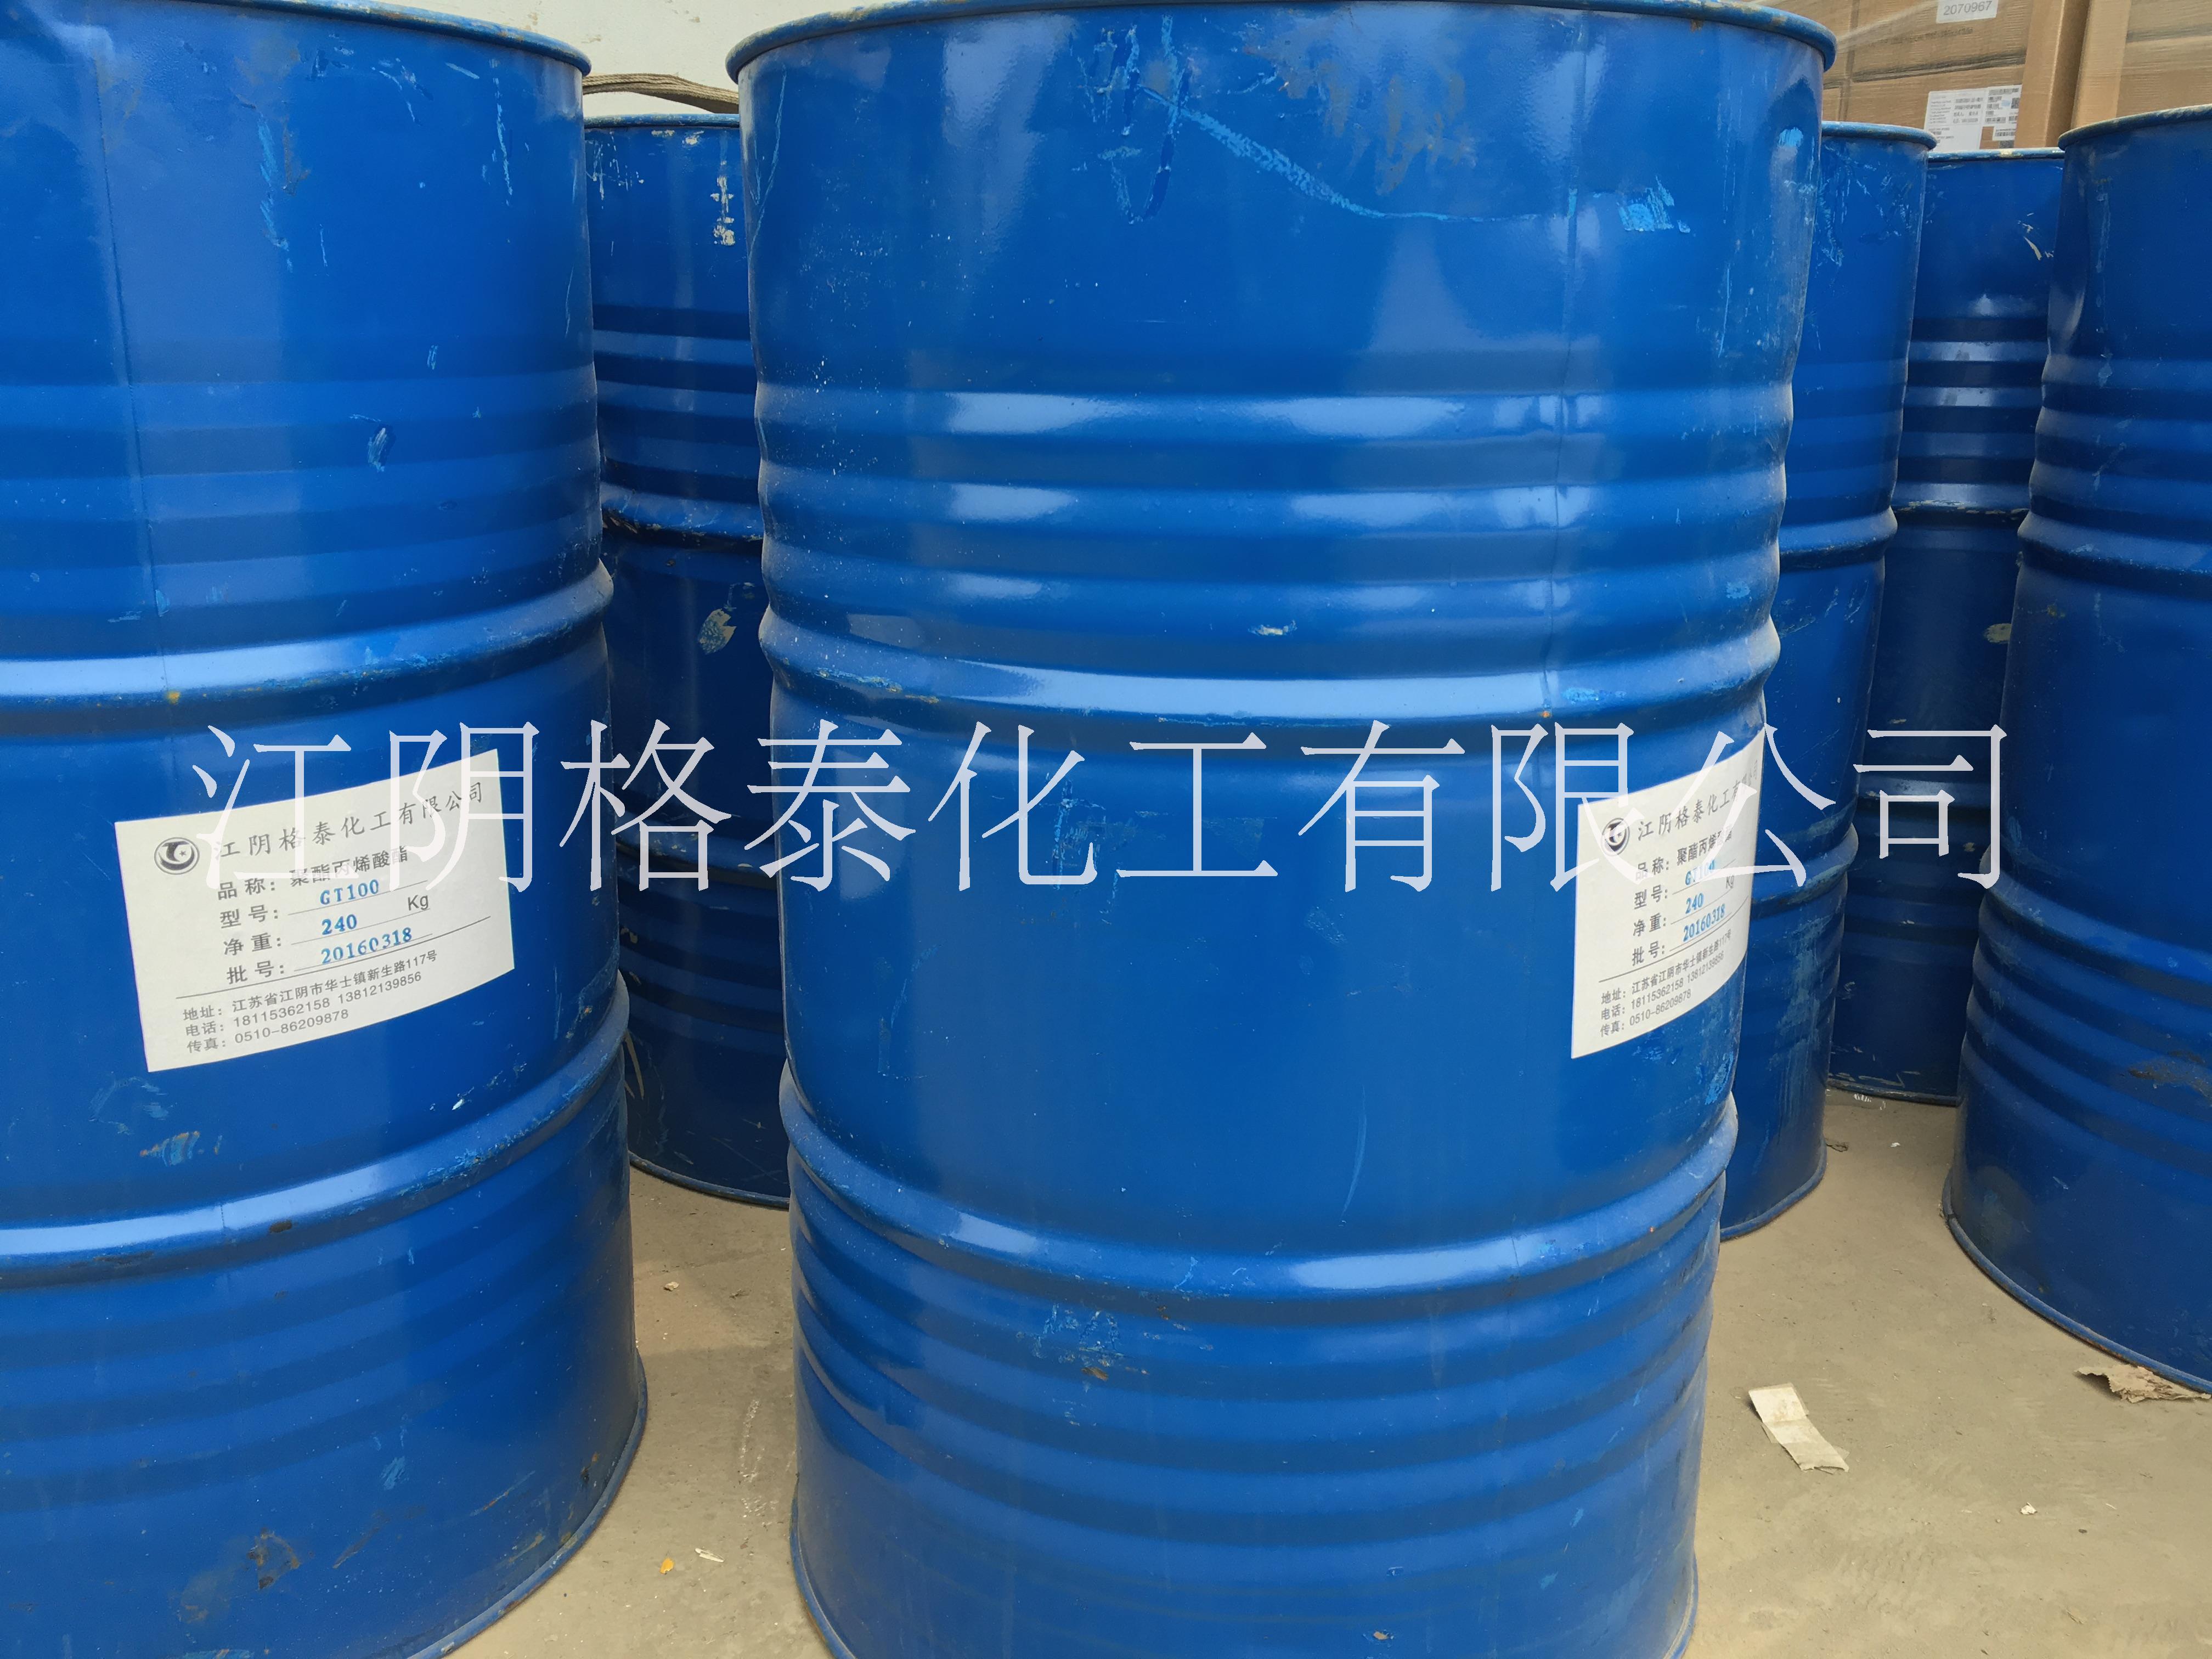 UV聚酯丙烯酸酯GT-6820、 UV低粘度耐黄变聚酯丙烯酸酯、UV耐黄变树脂